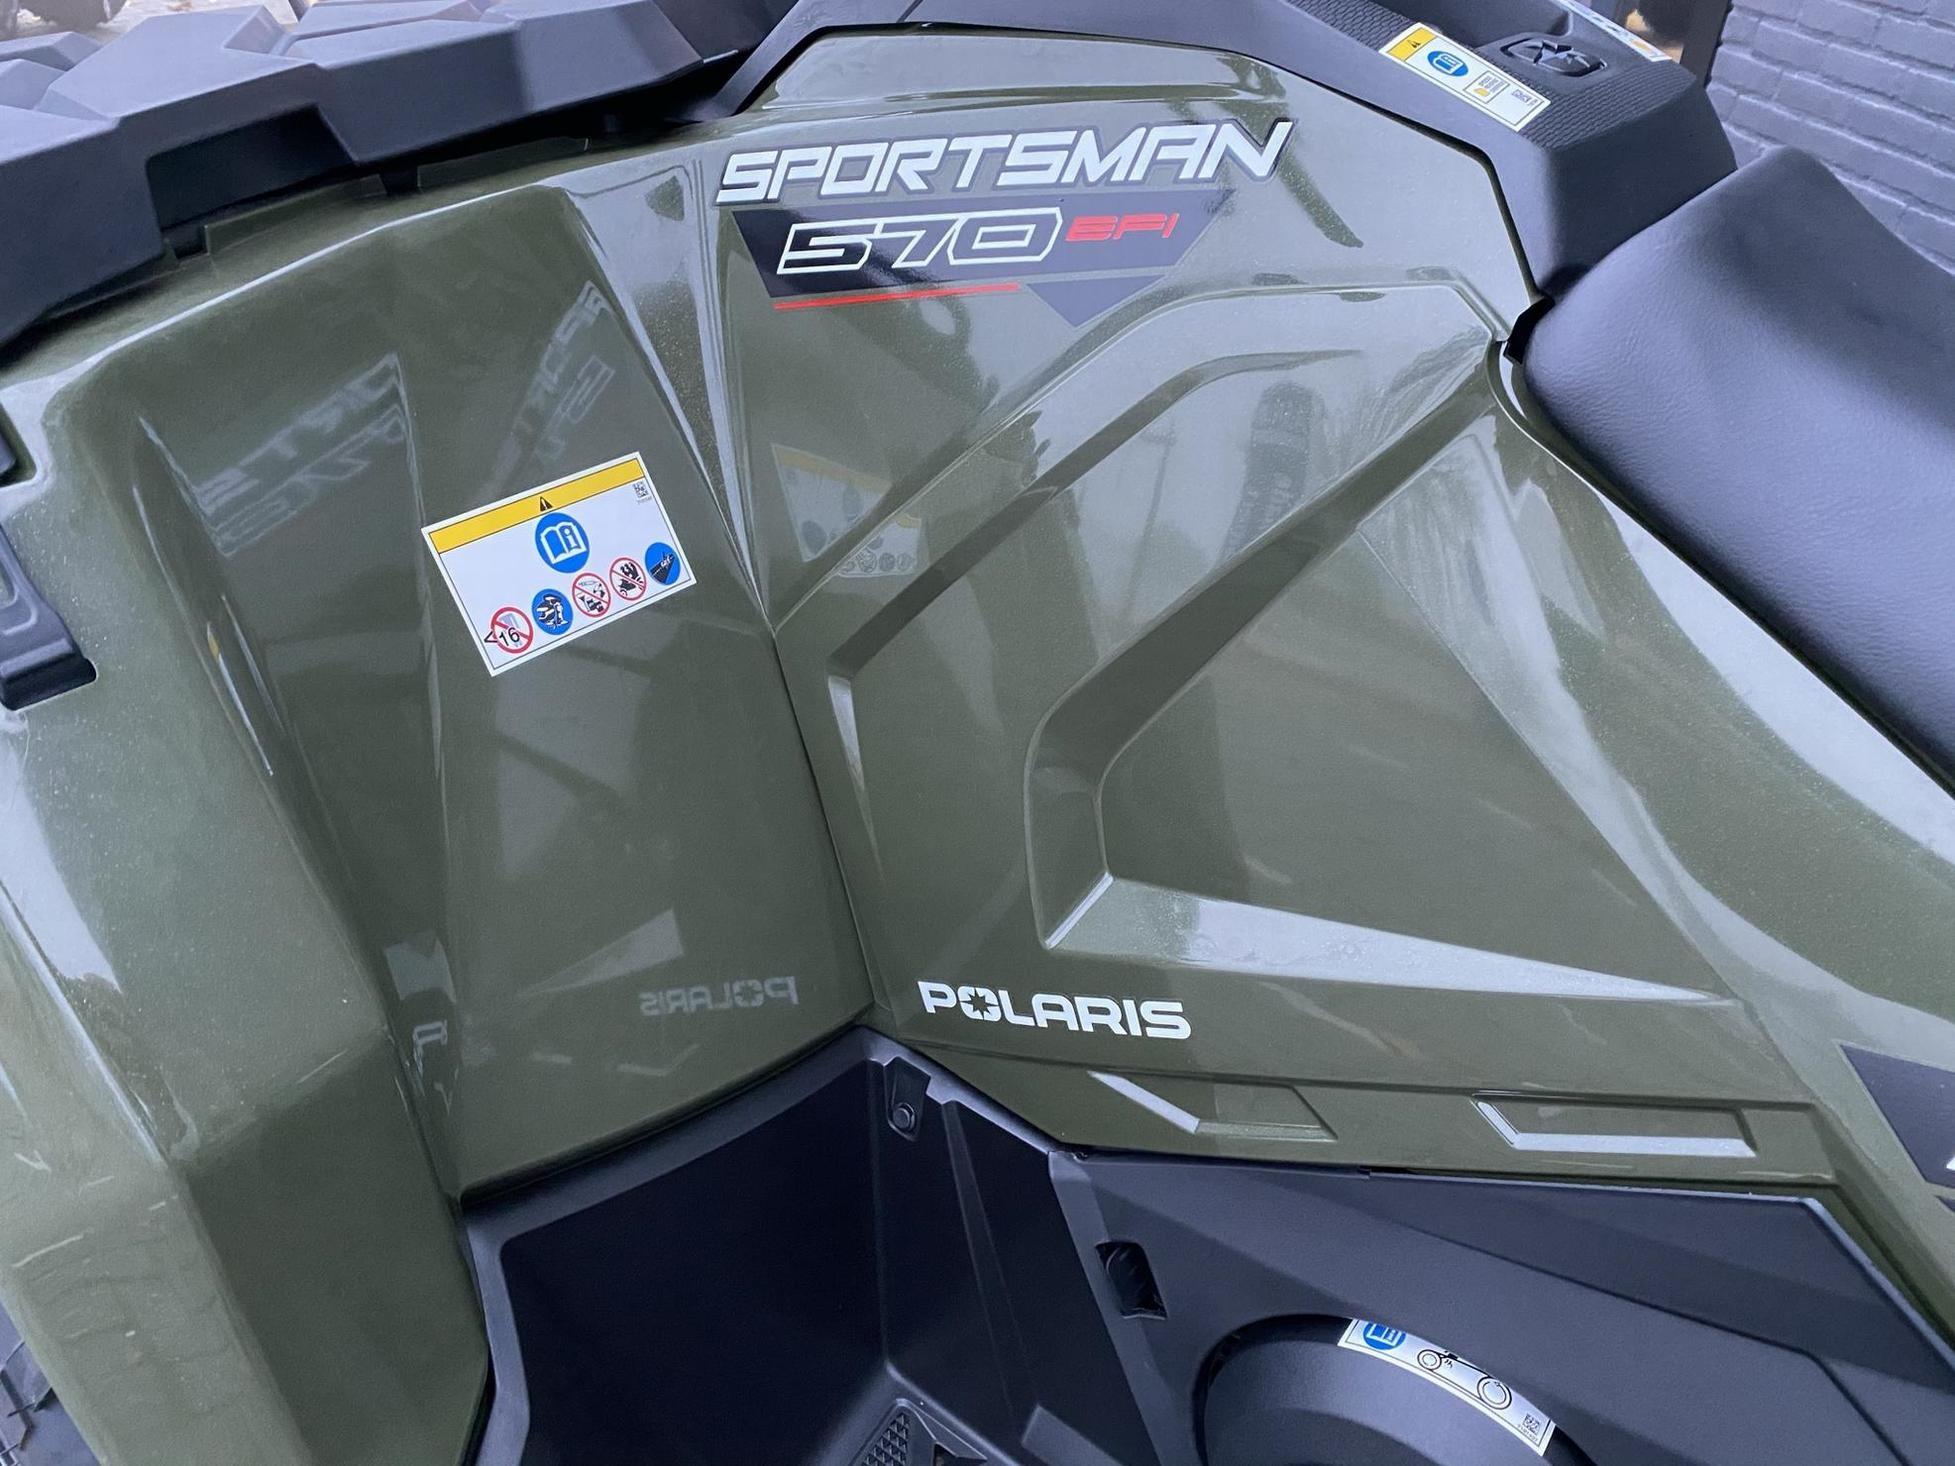 POLARIS Sportsman 570 T3b